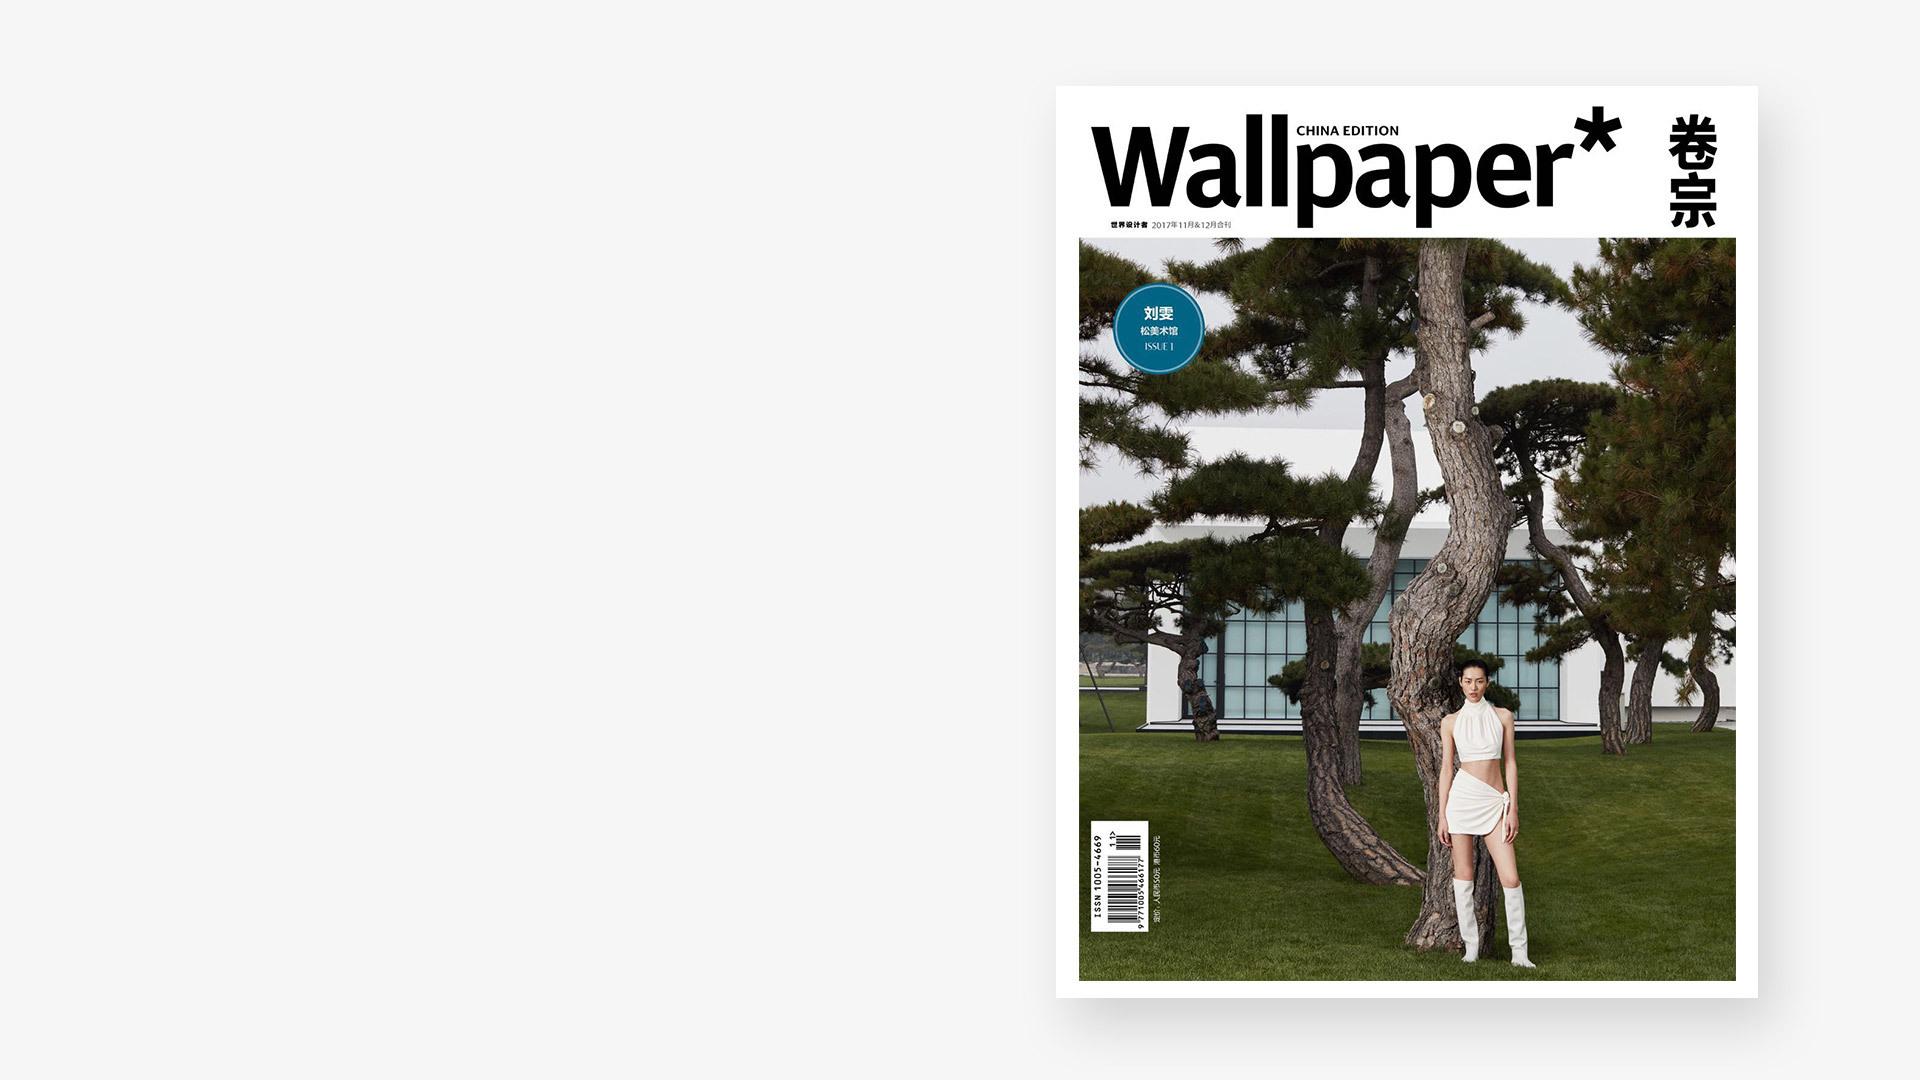 《Wallpaper*卷宗》創刊號<br/>尋找光與影的裝飾靈感